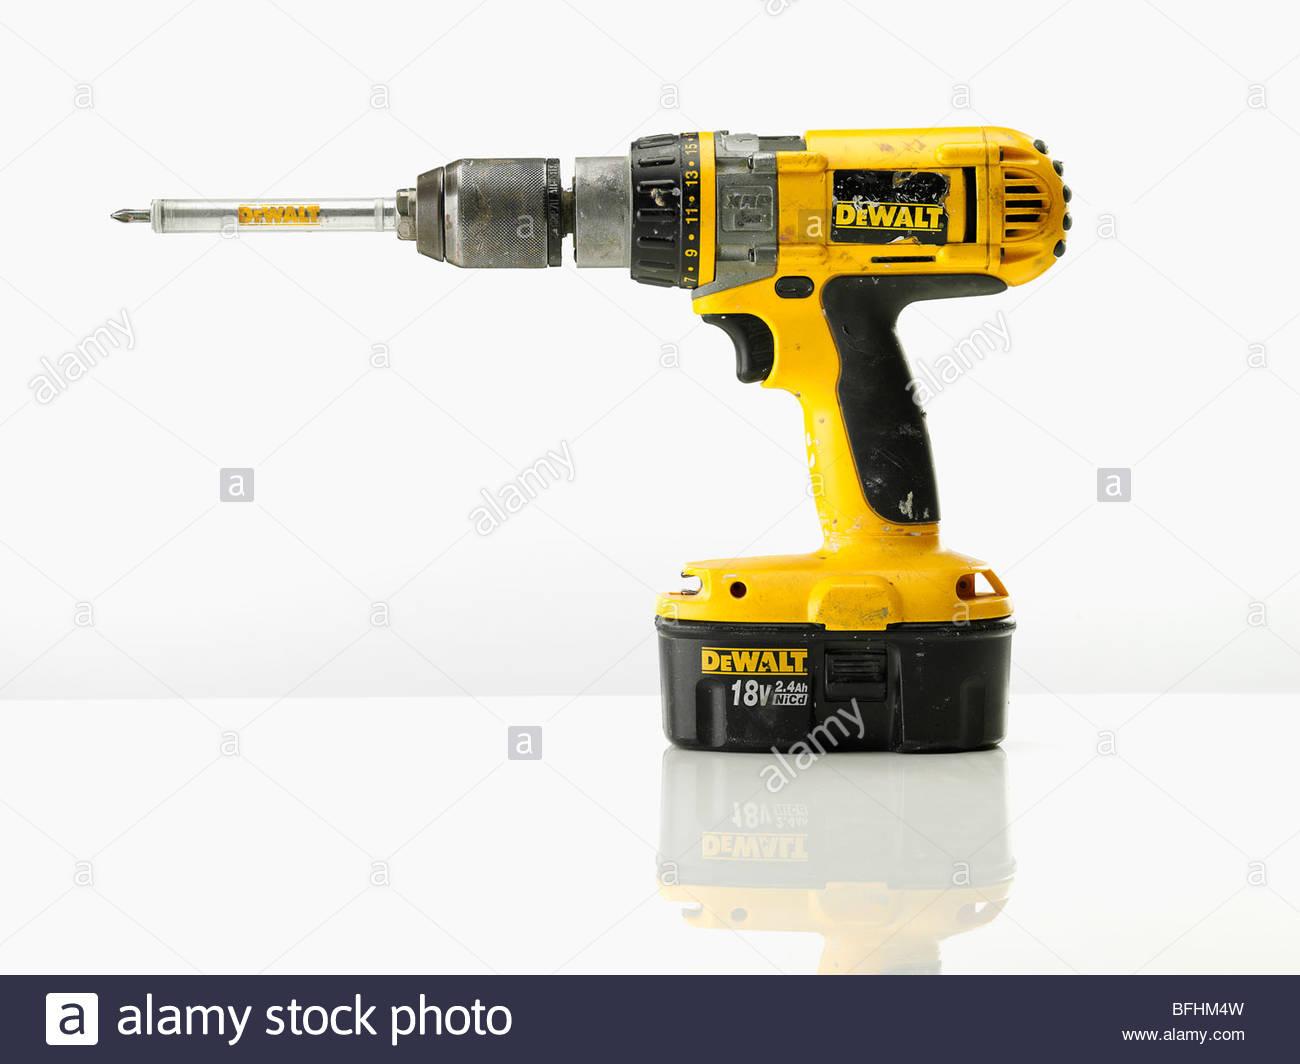 Dewalt Power drill cordless - Stock Image